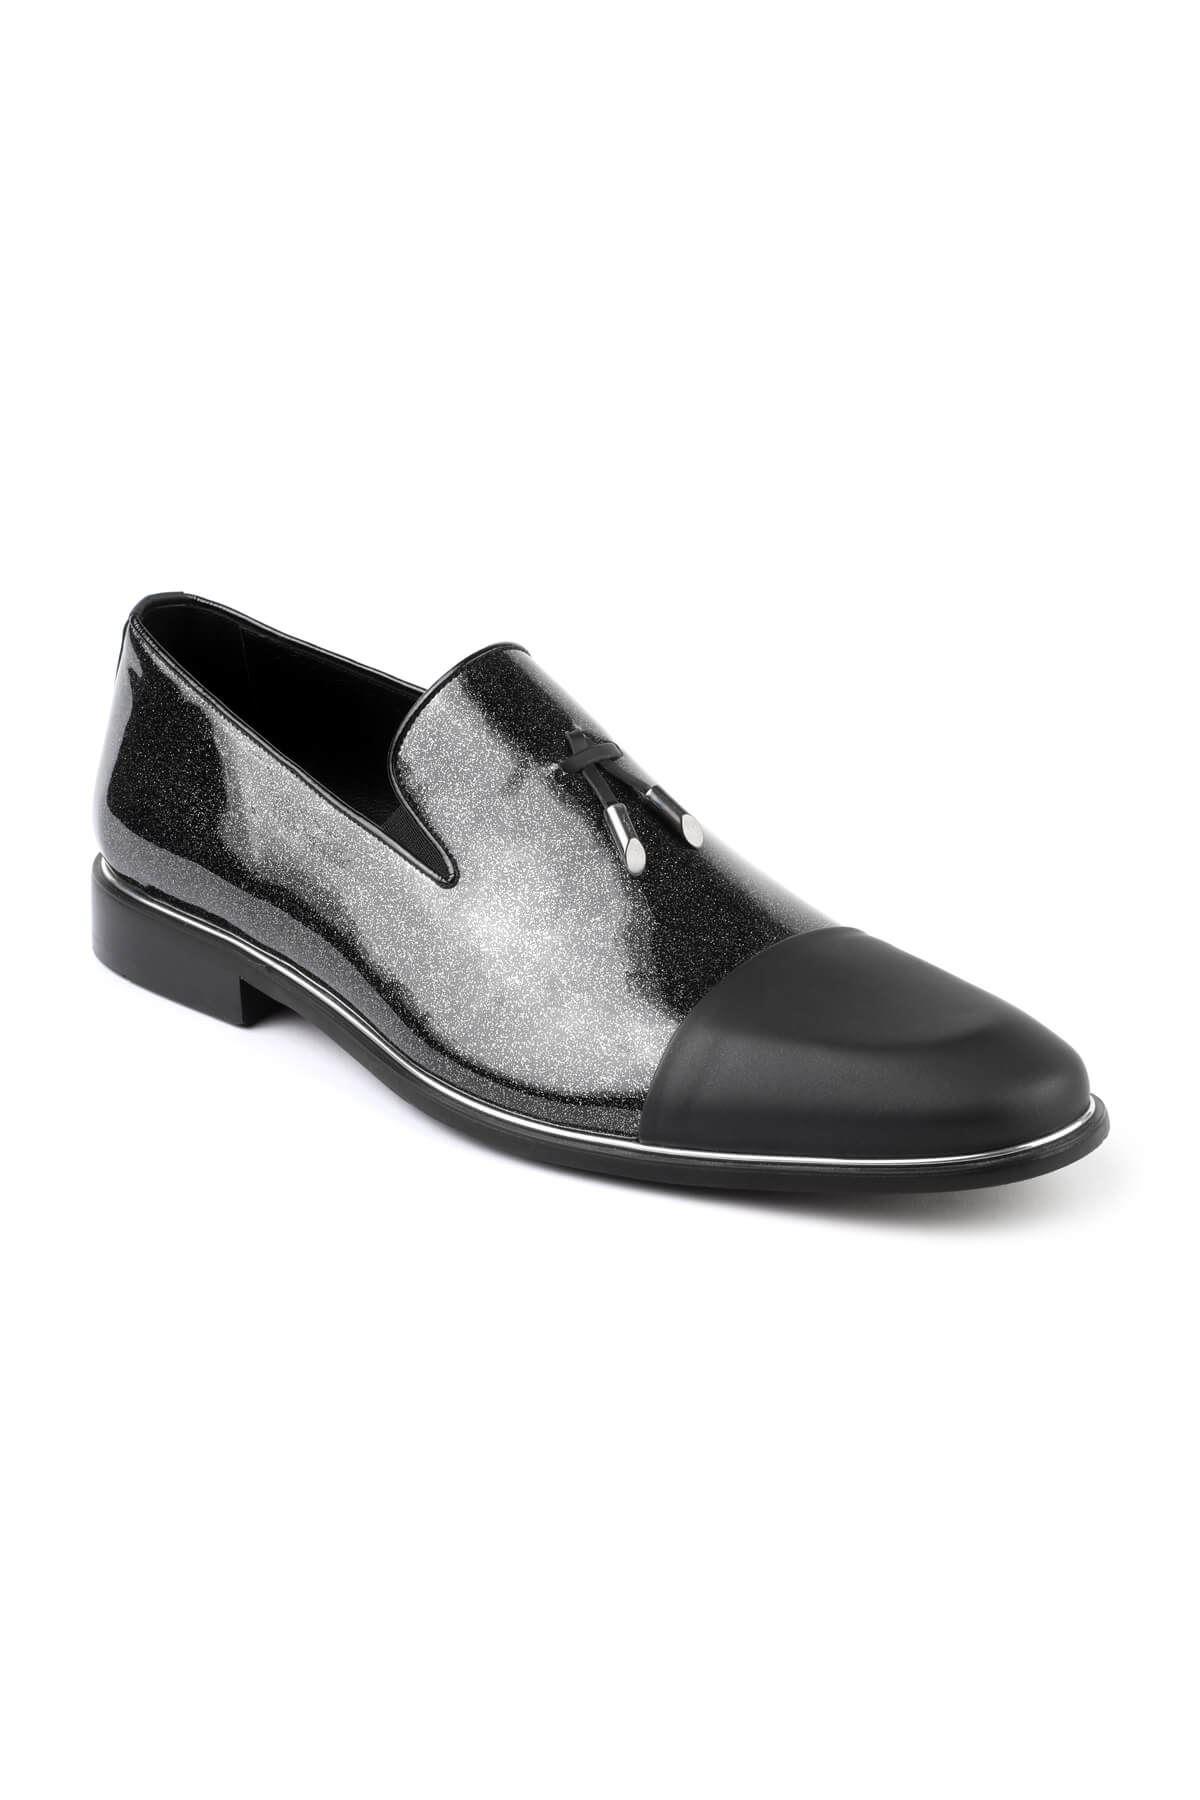 Libero T956 Black Classic Shoes